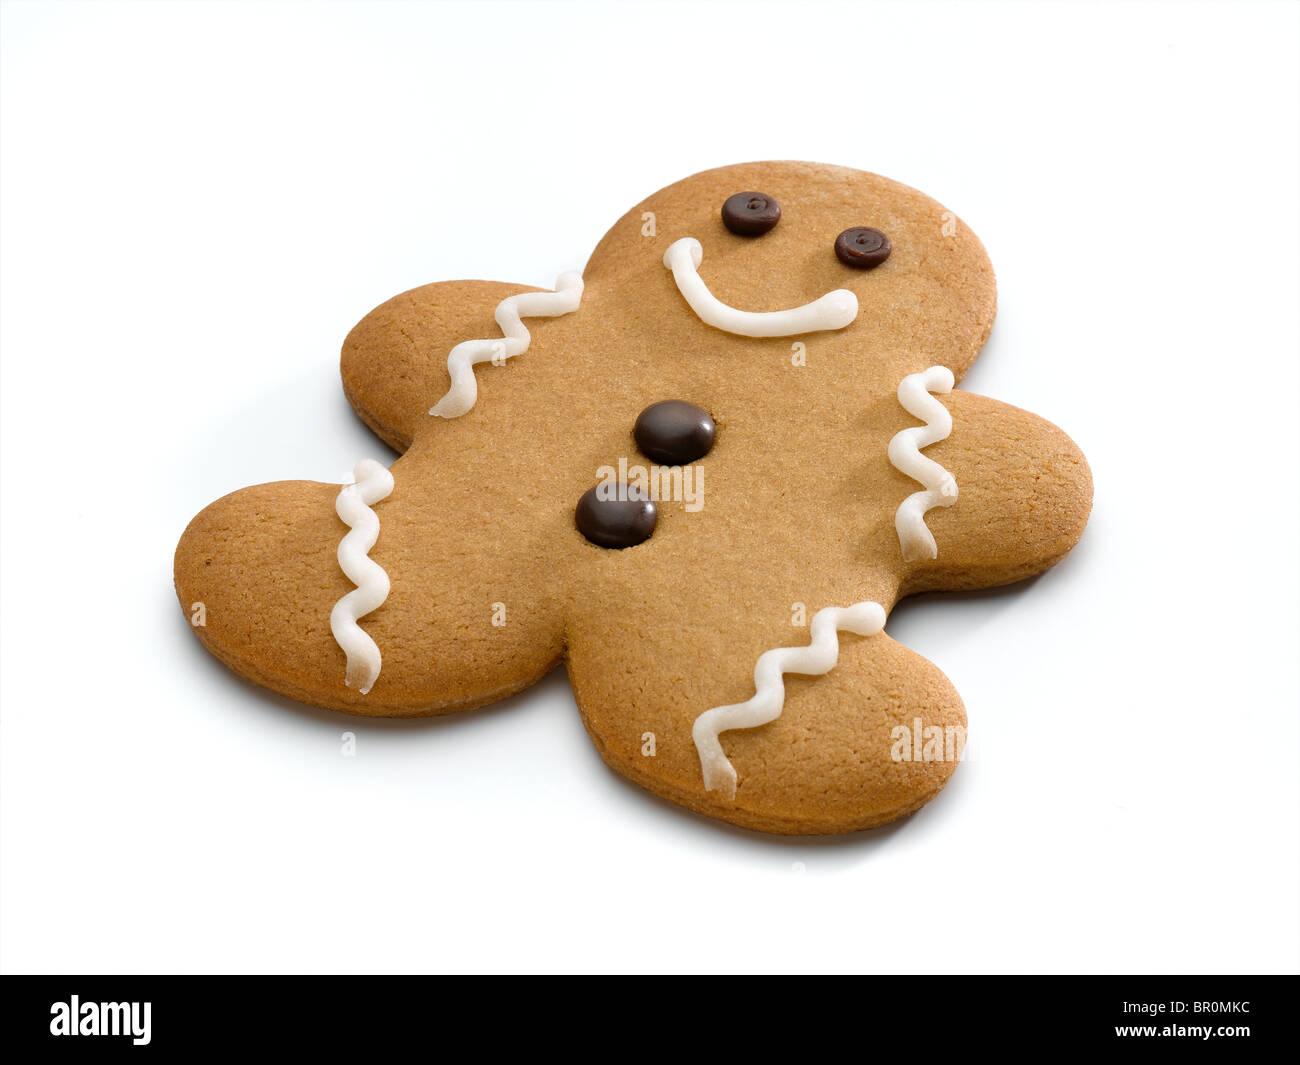 gingerbread man - Stock Image